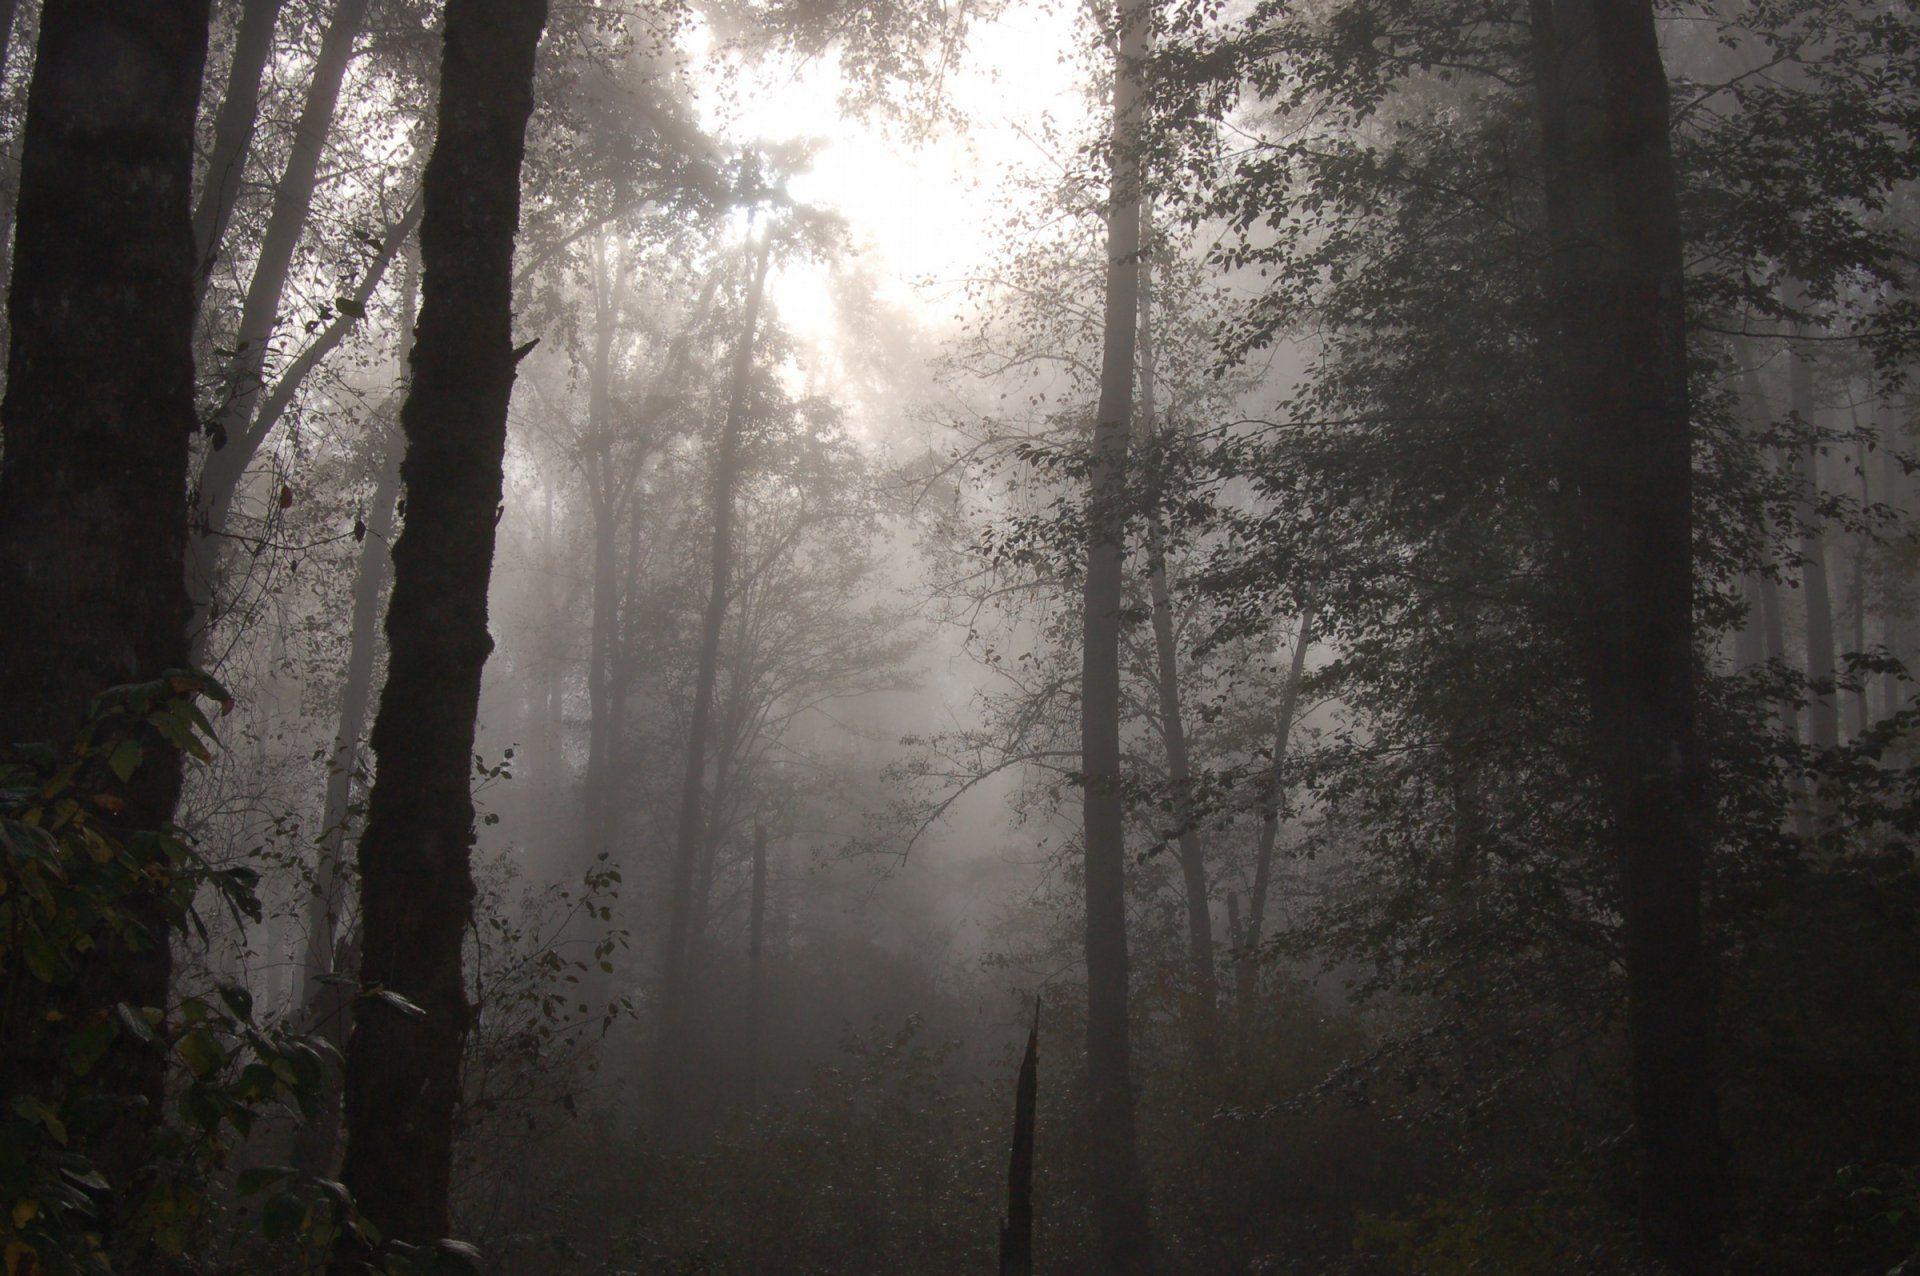 Foggy Forest Wallpaper 1080p jRh Earth Pinterest